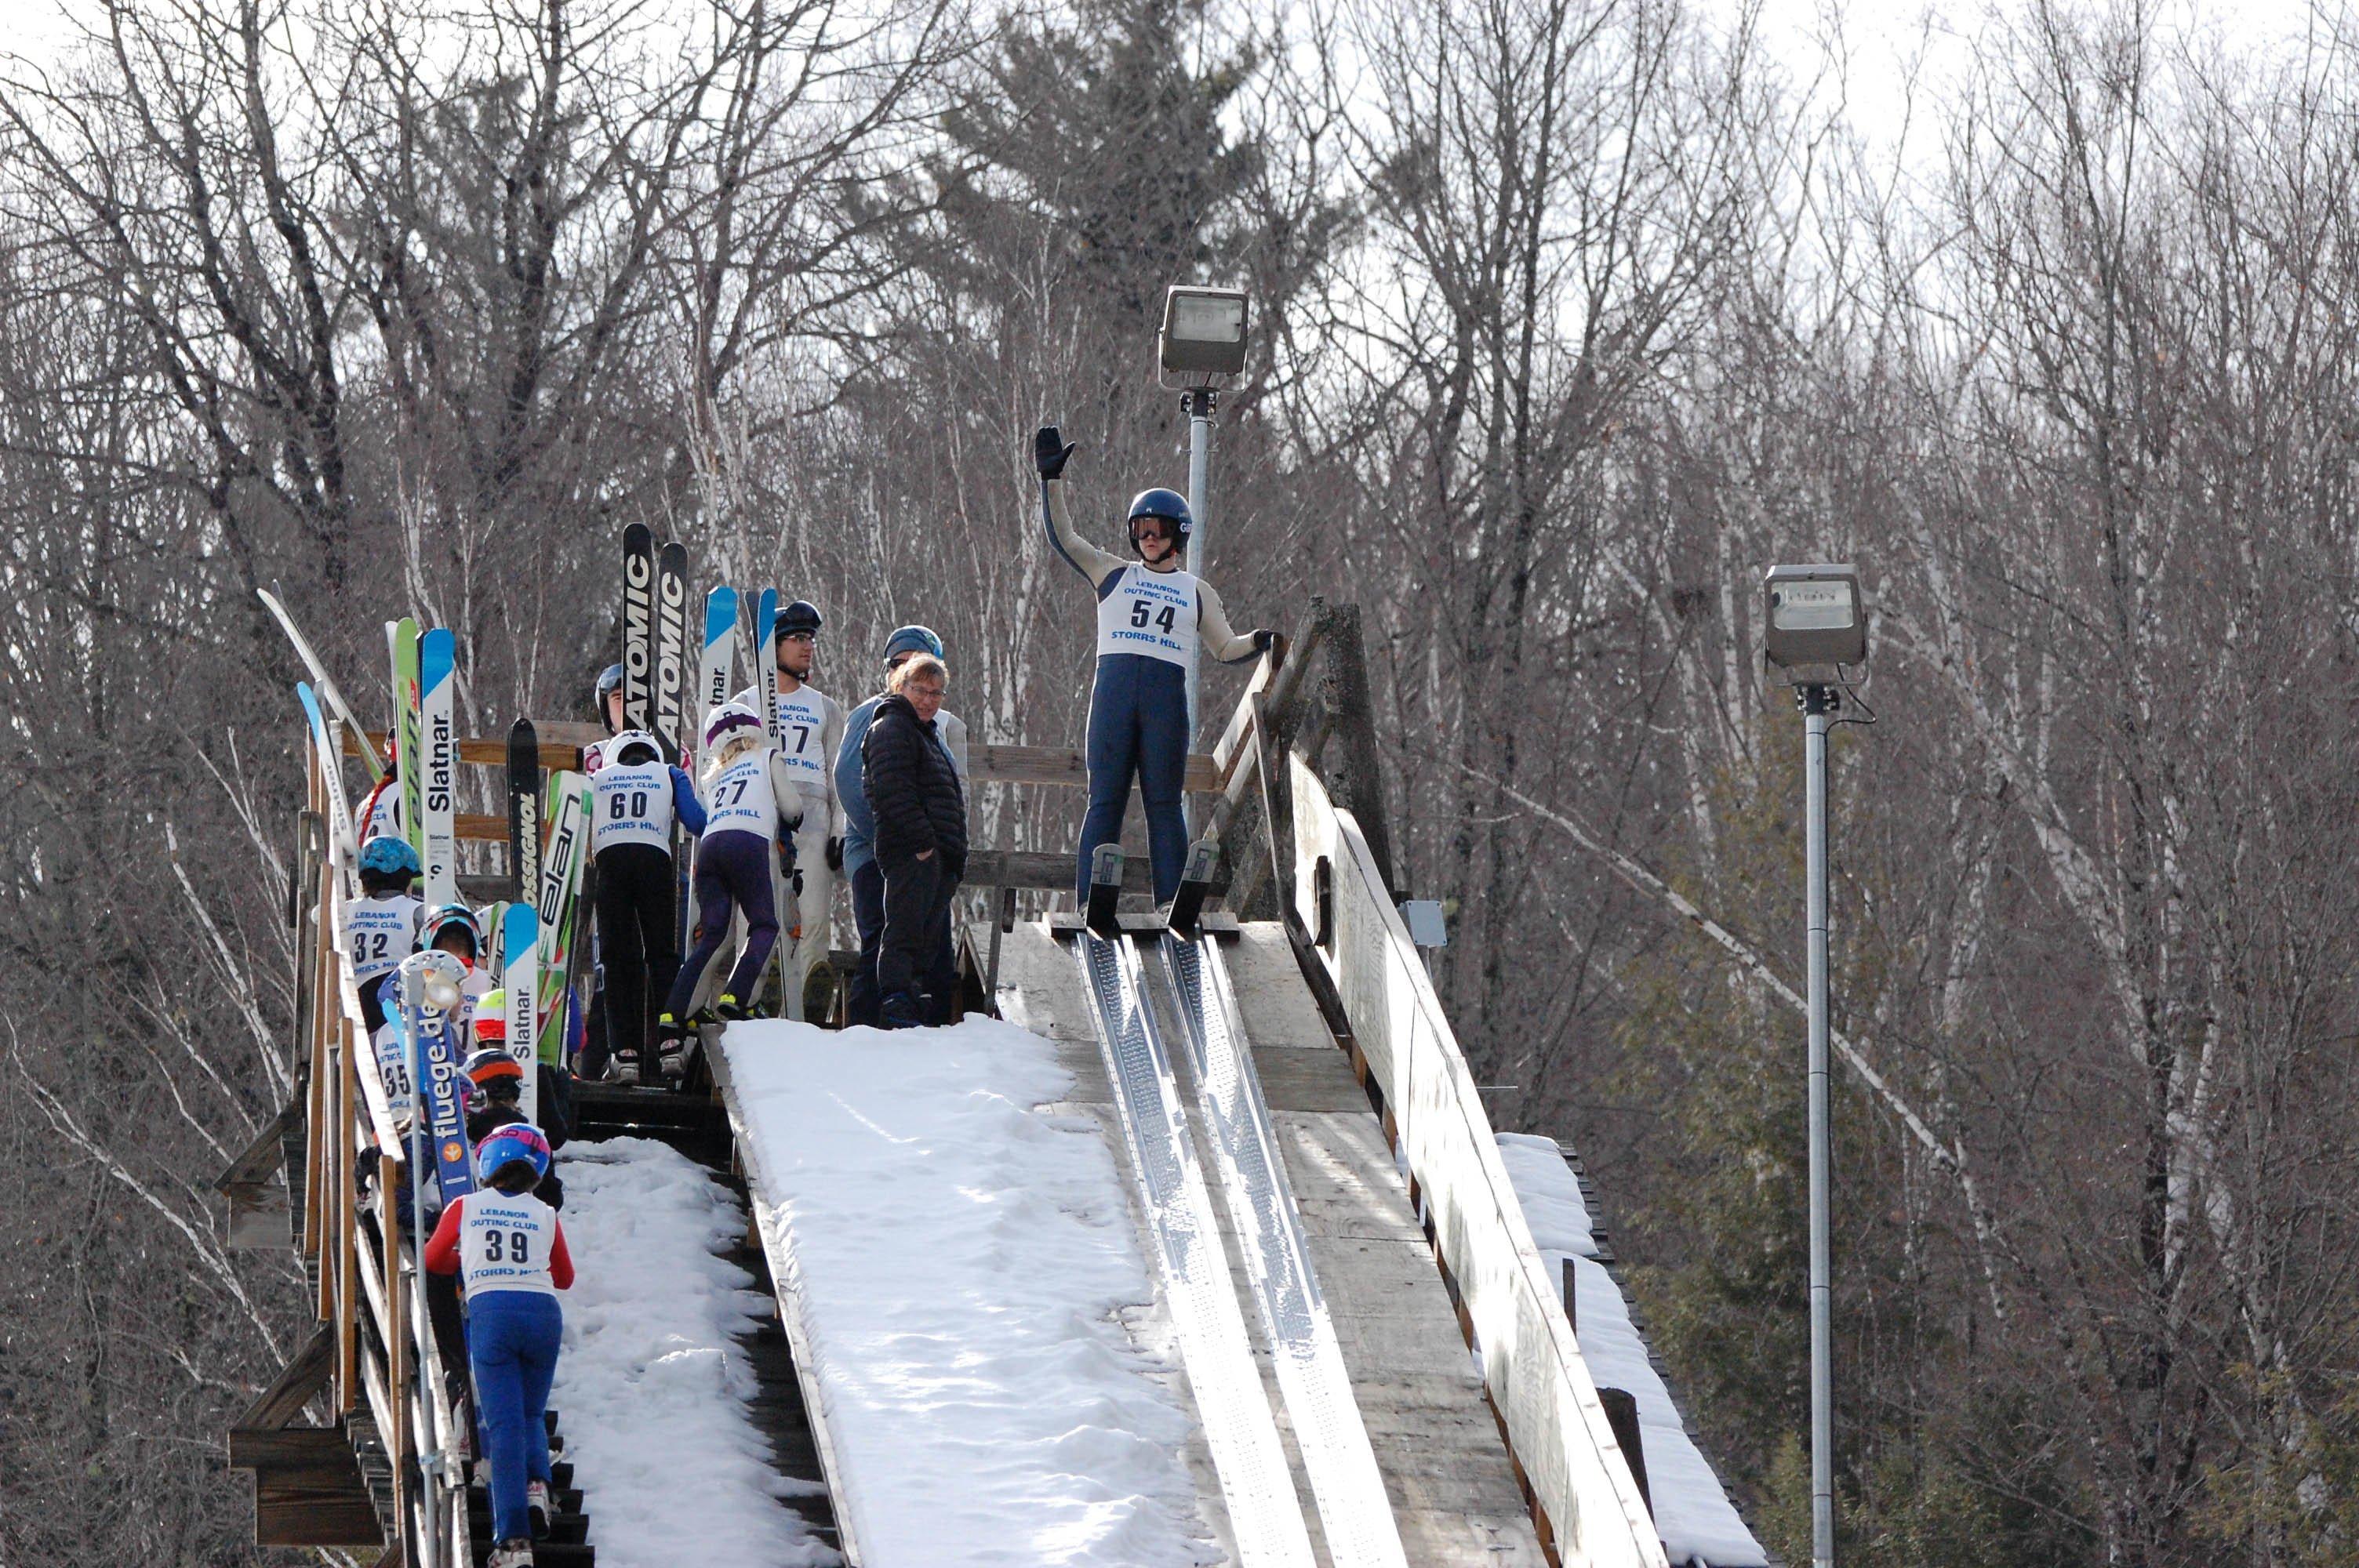 Proctor Academy Ski Jumping Athletics